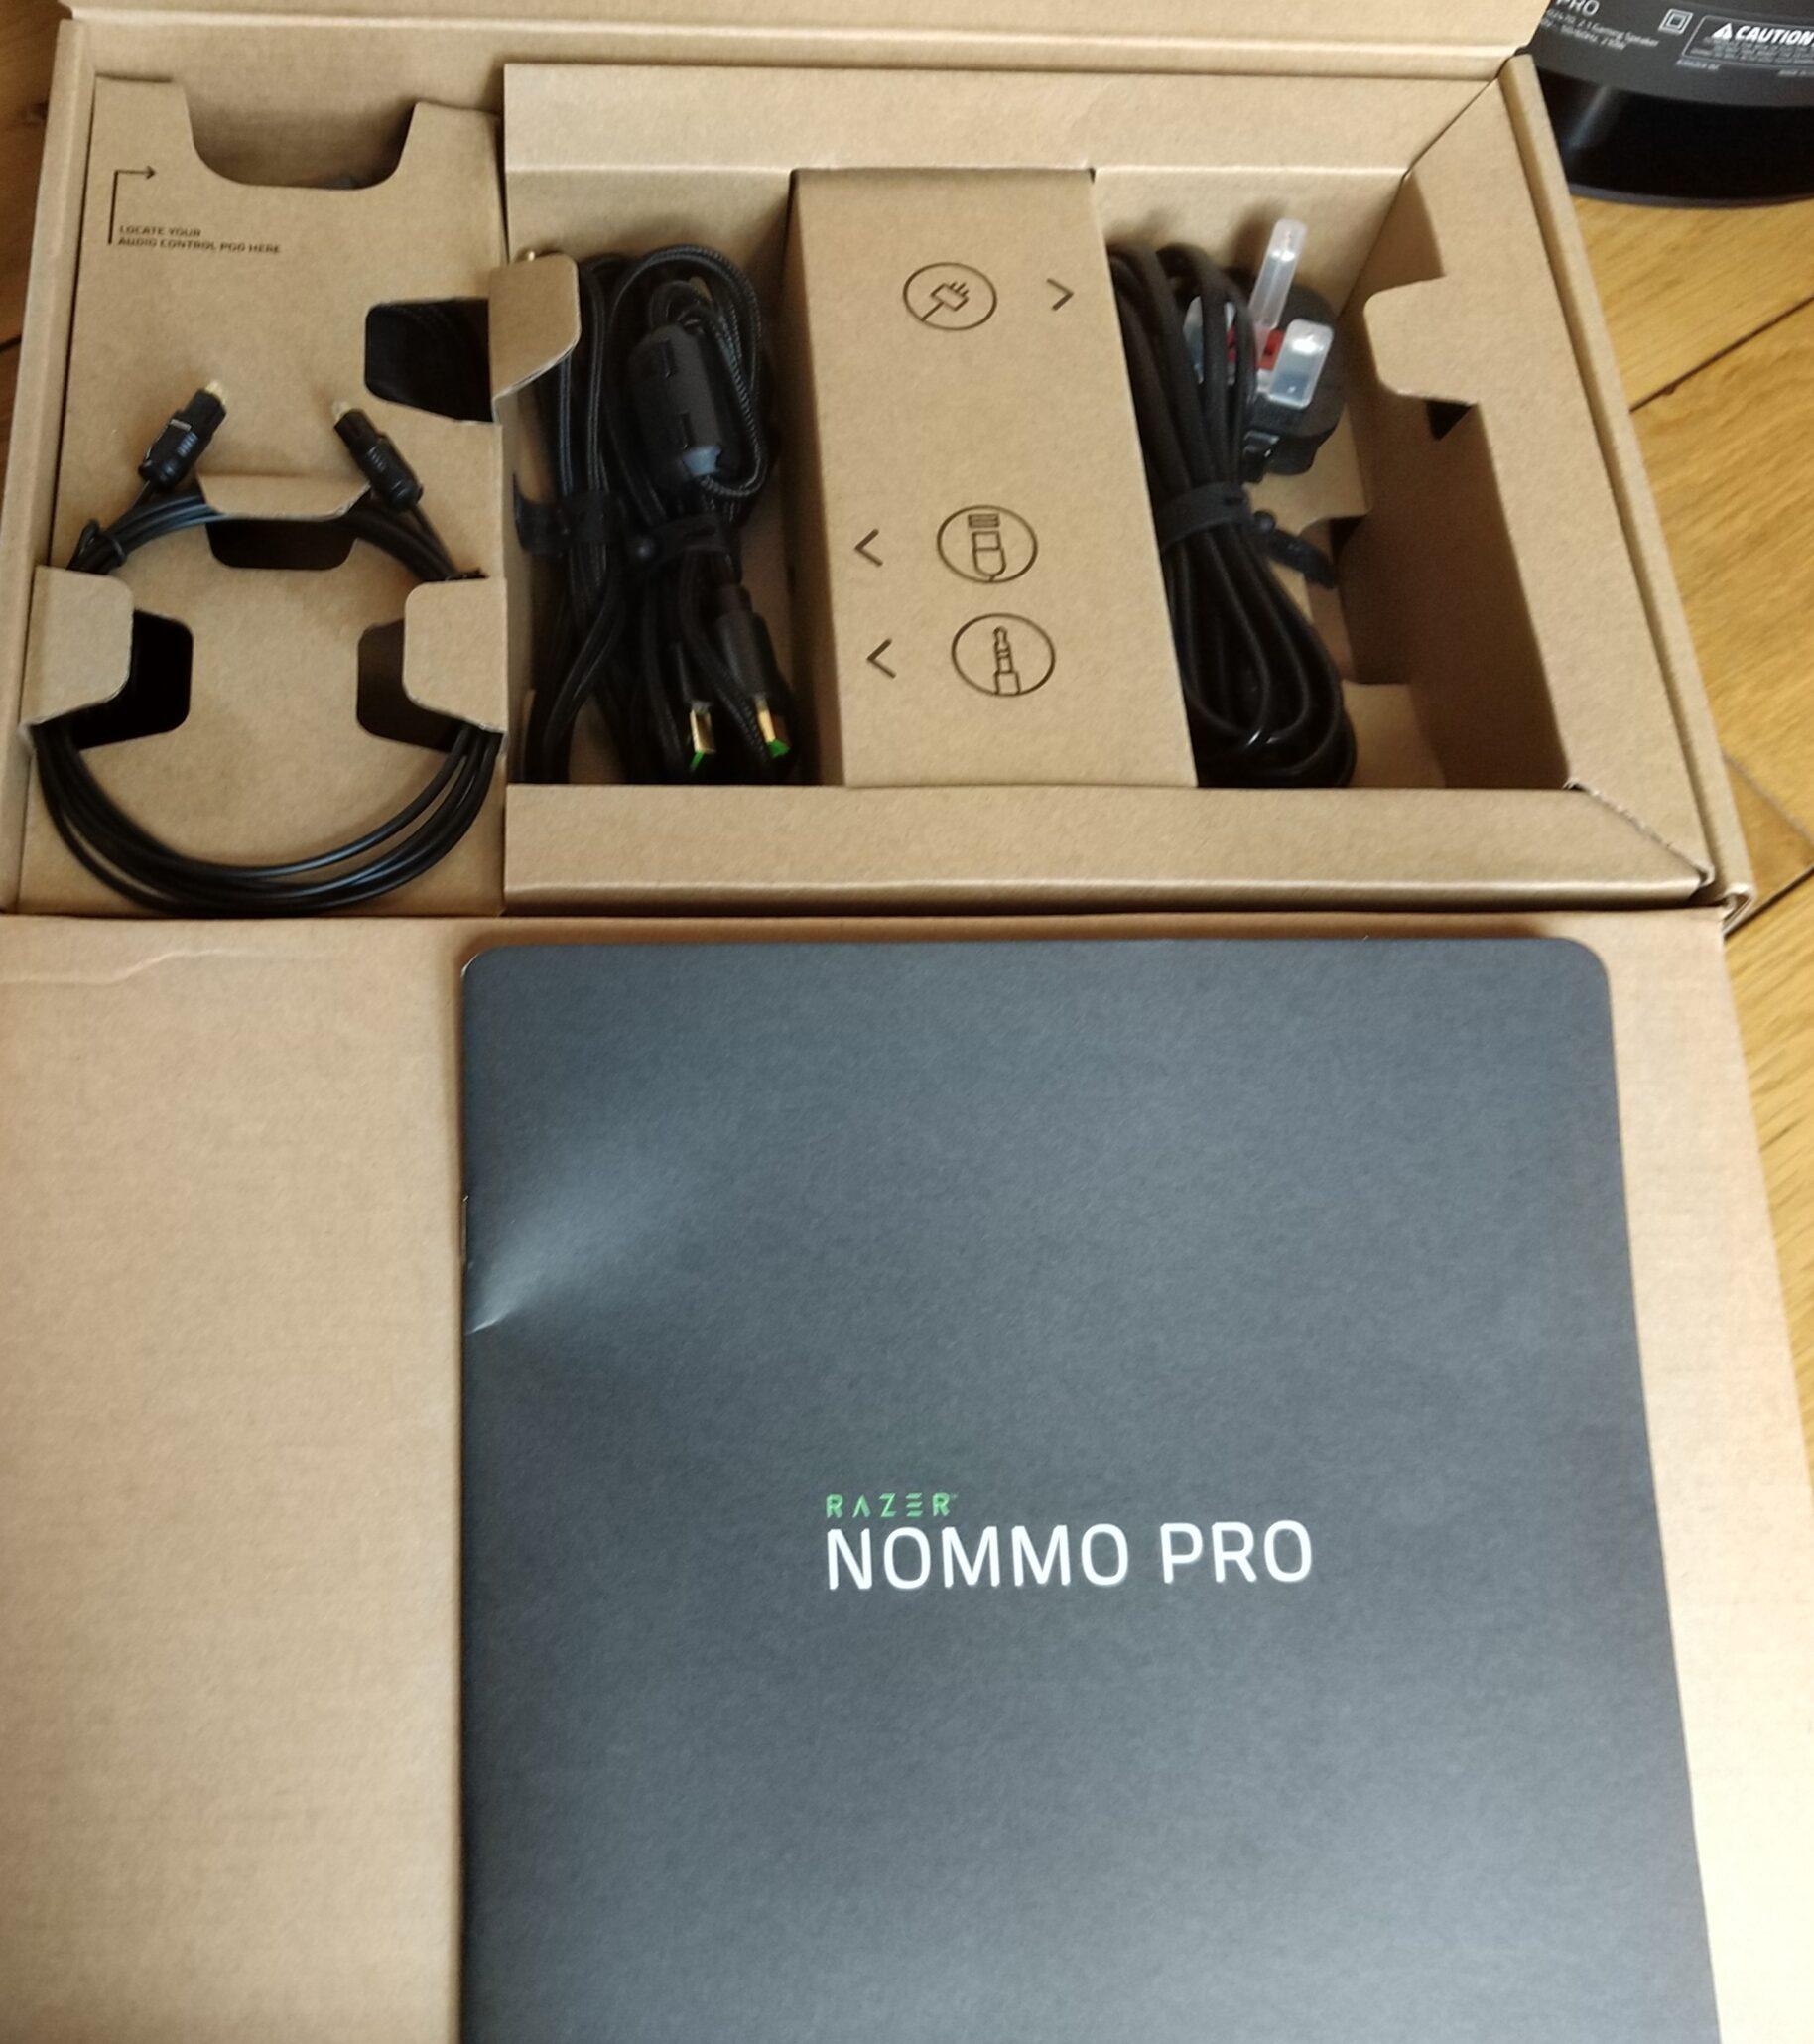 razer-nommo-pro-cables